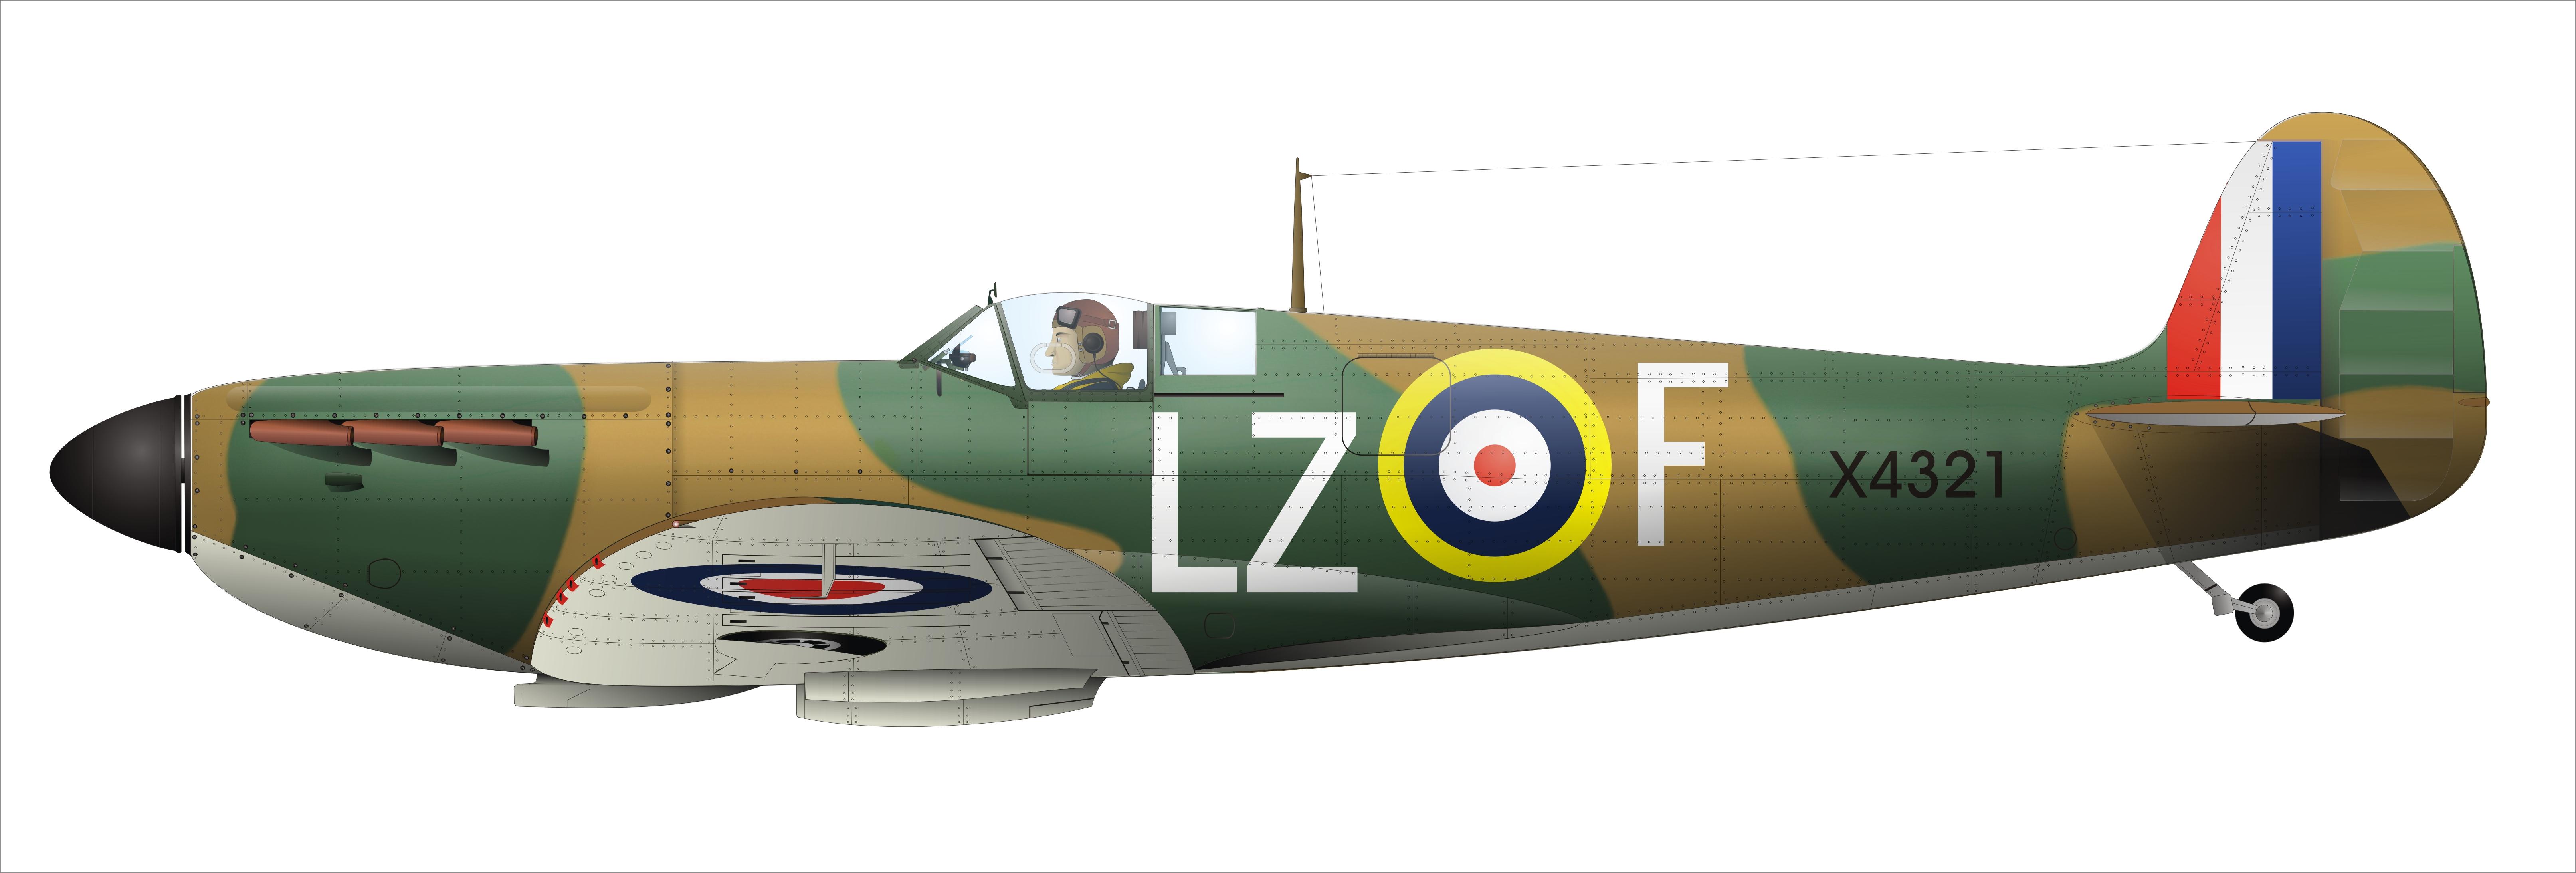 Spitfire MkIa RAF 234Sqn AZD Robert Doe X4036 Middle Wallop 1940 0A